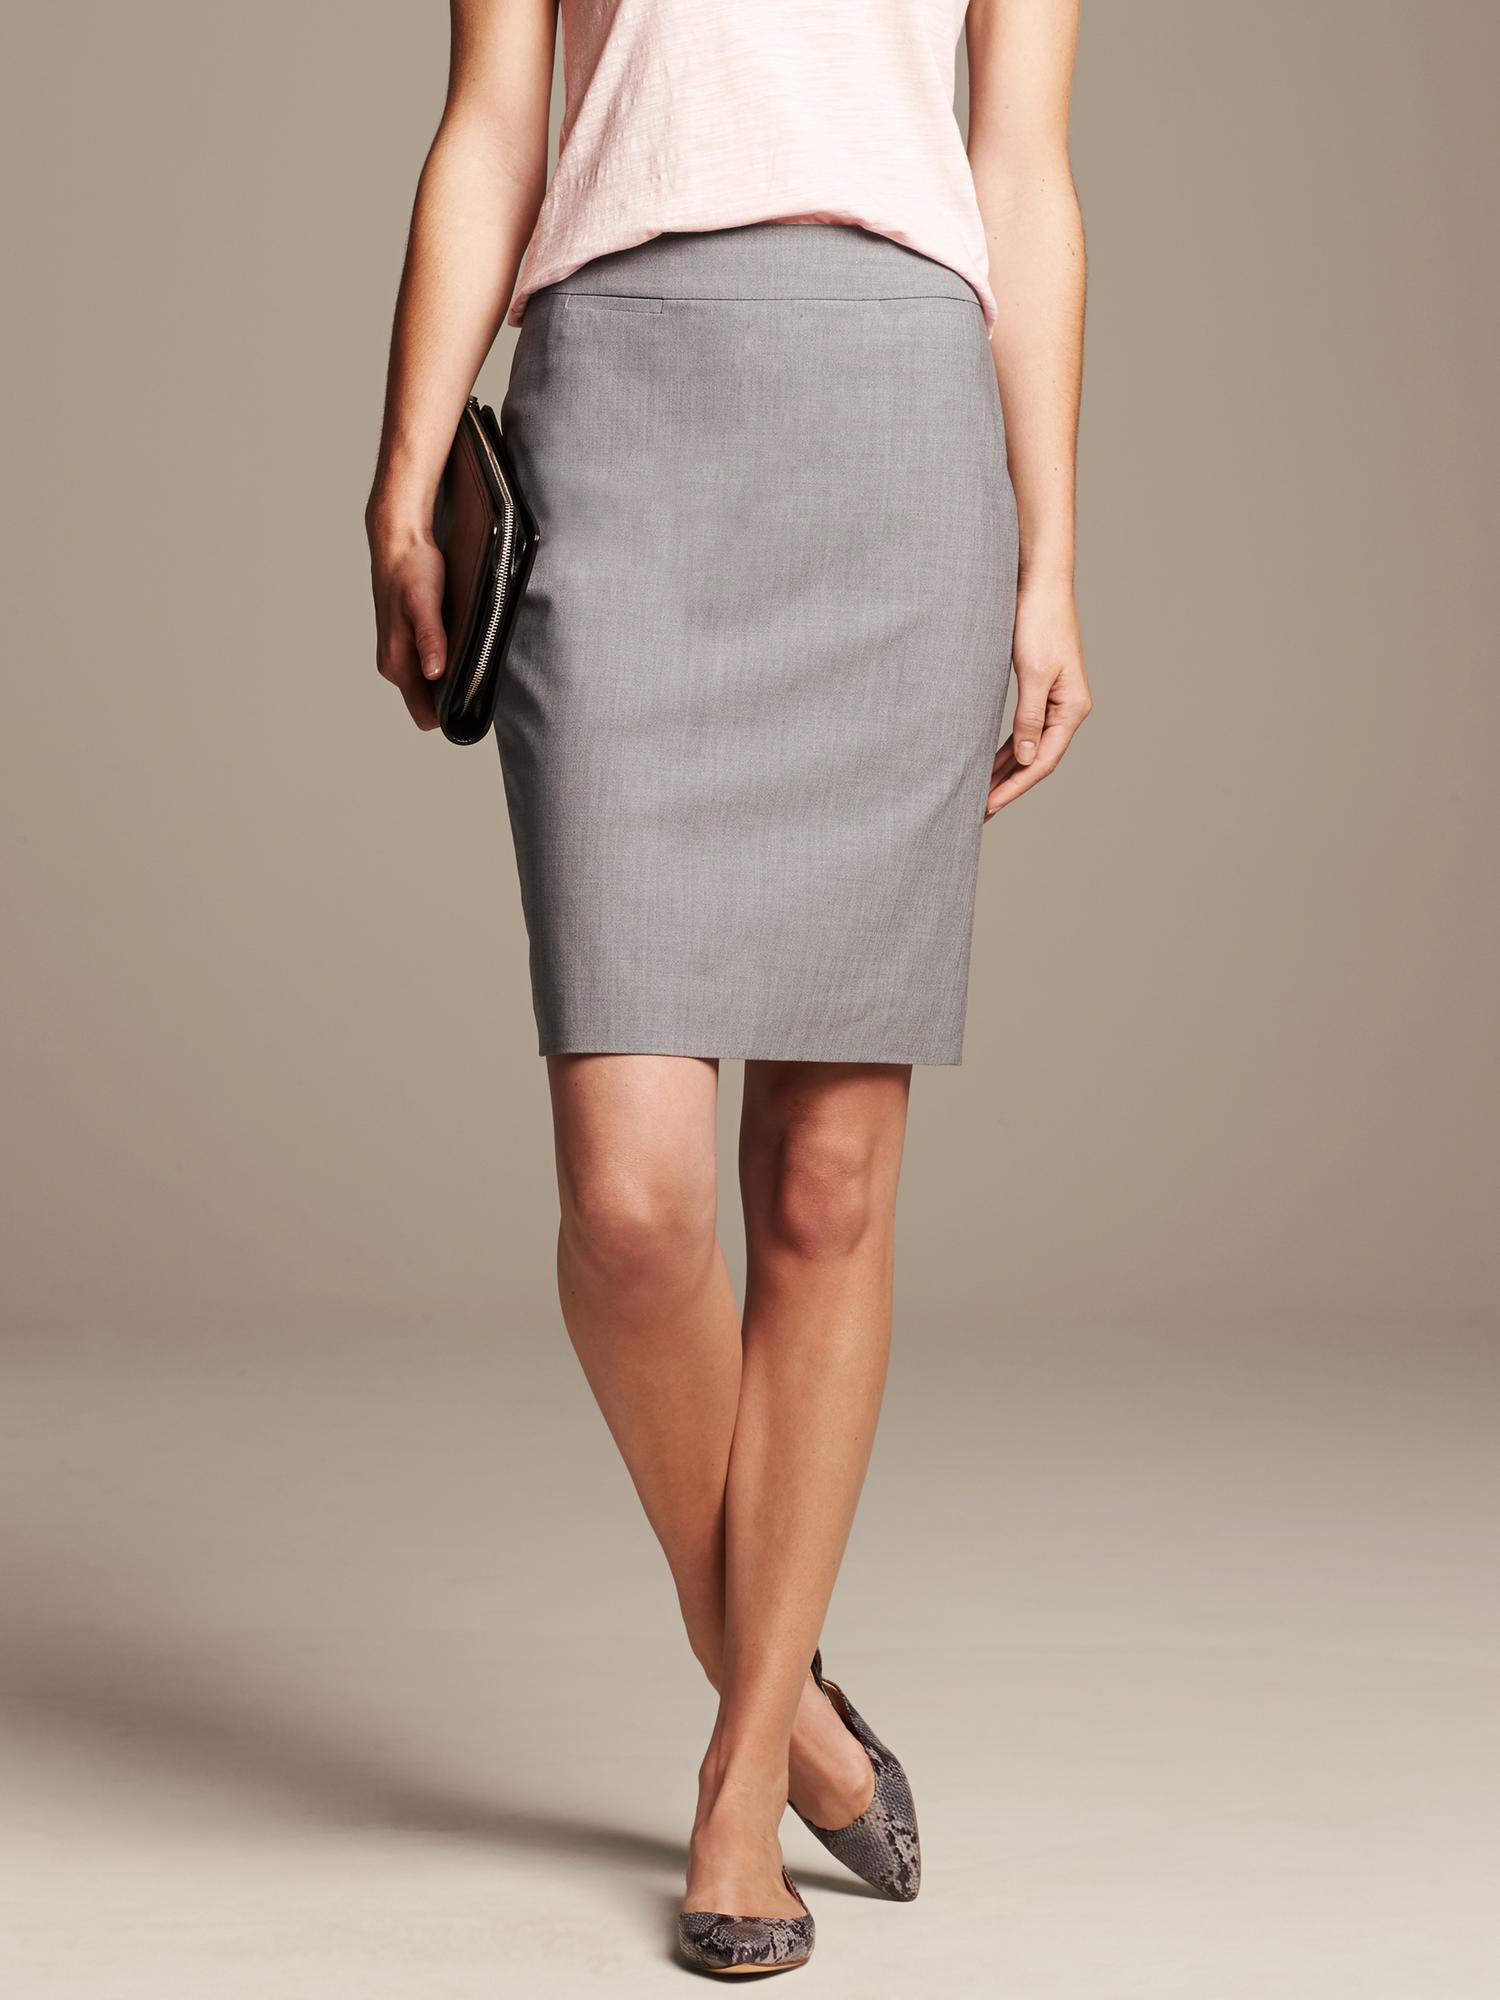 Light Gray Pencil Skirt - Dress Ala